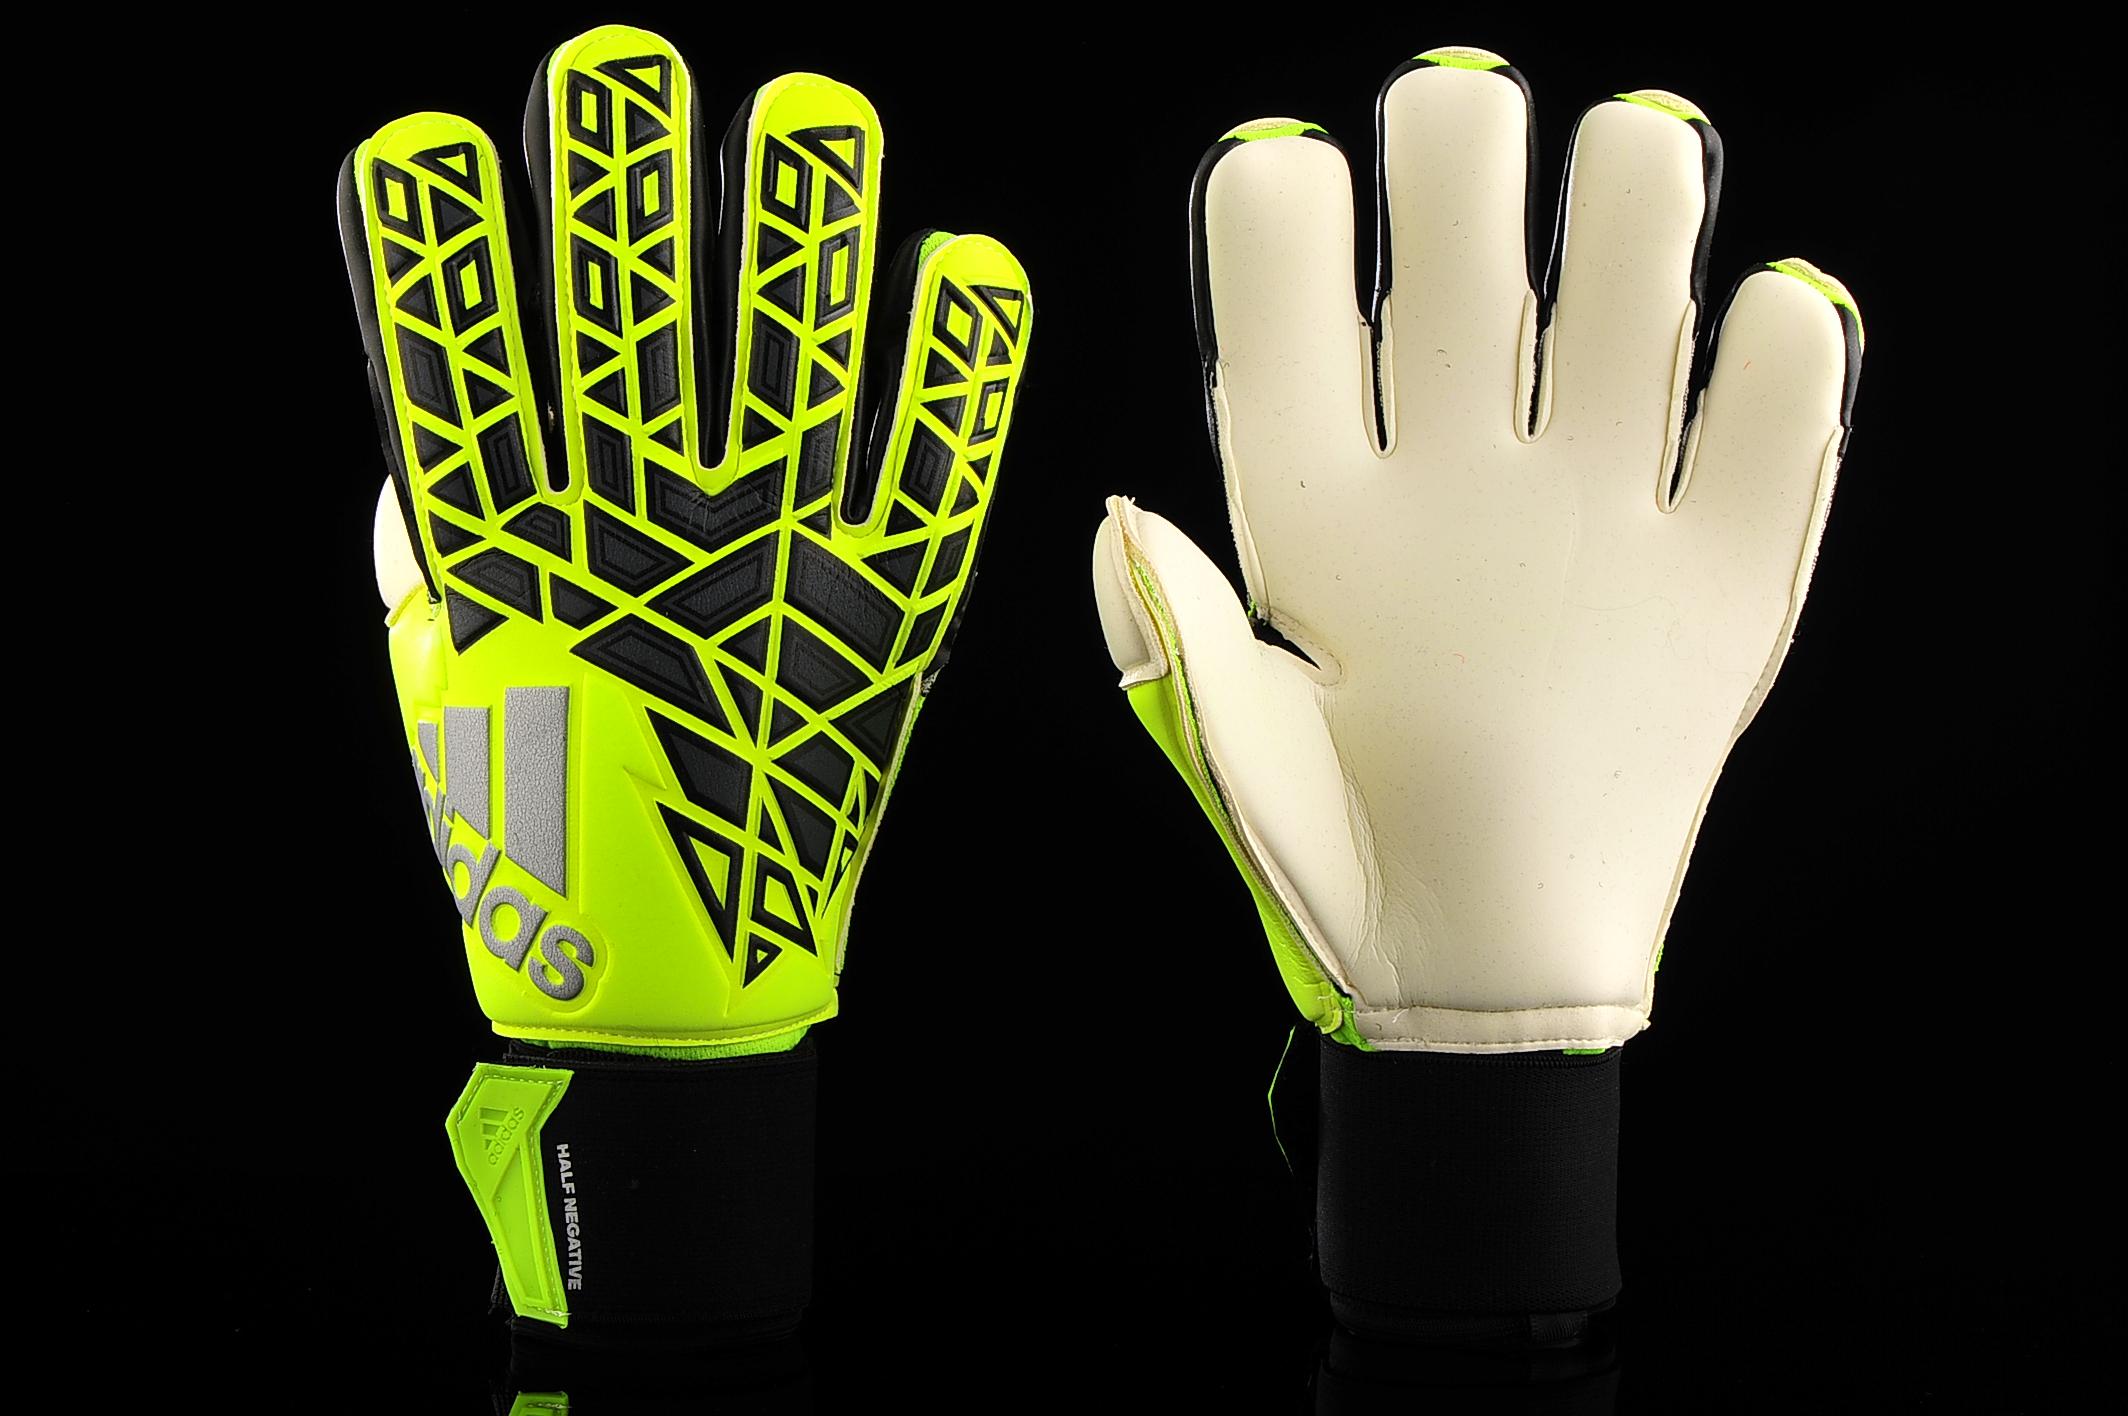 Hacia atrás Talla cola  Goalkeeper Gloves adidas Ace Half Negative AP6997   R-GOL.com - Football  boots & equipment